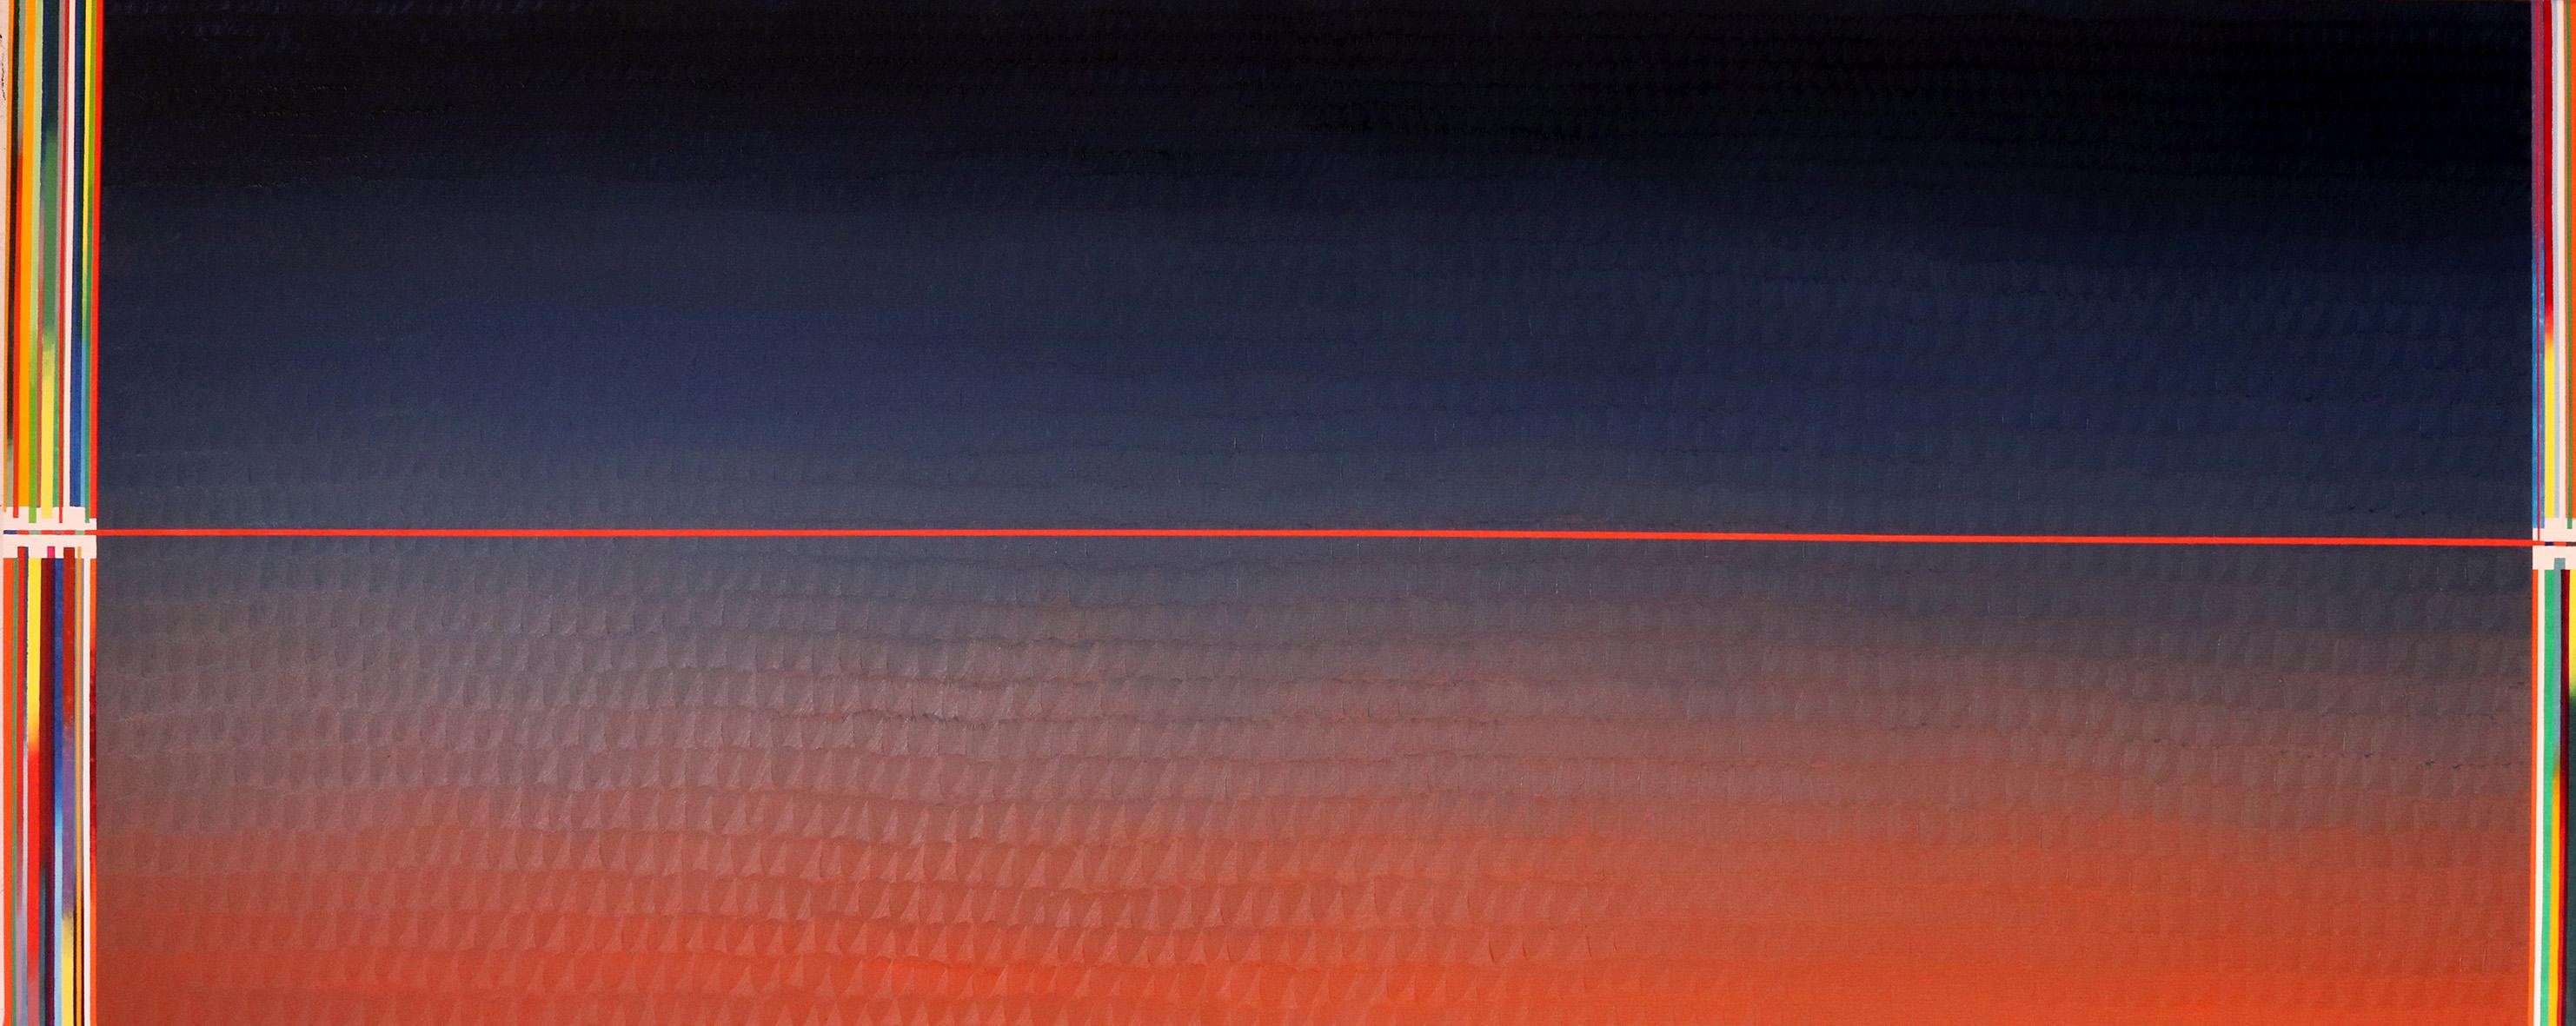 Redline horizon (v 6.0) (81x200cm) 2019 (private collection, New York)